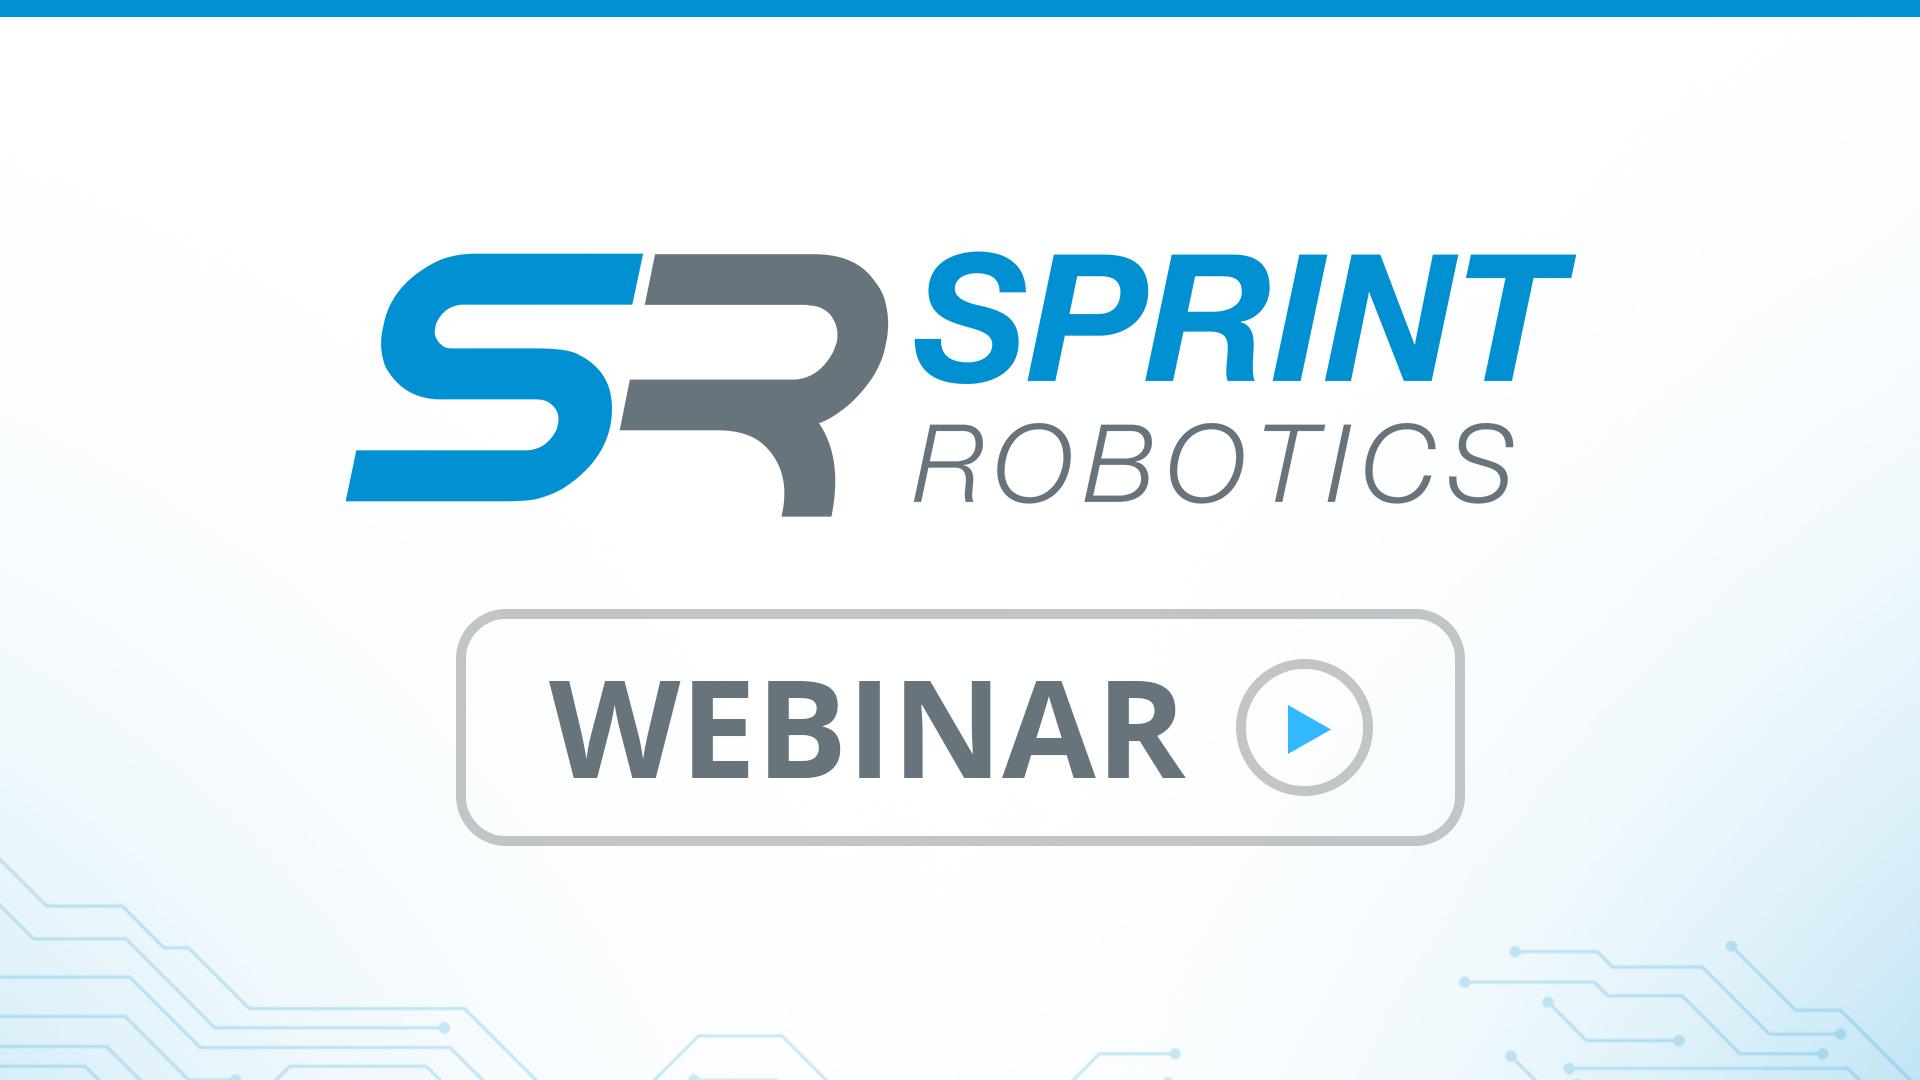 SPRINT Robotics webinar